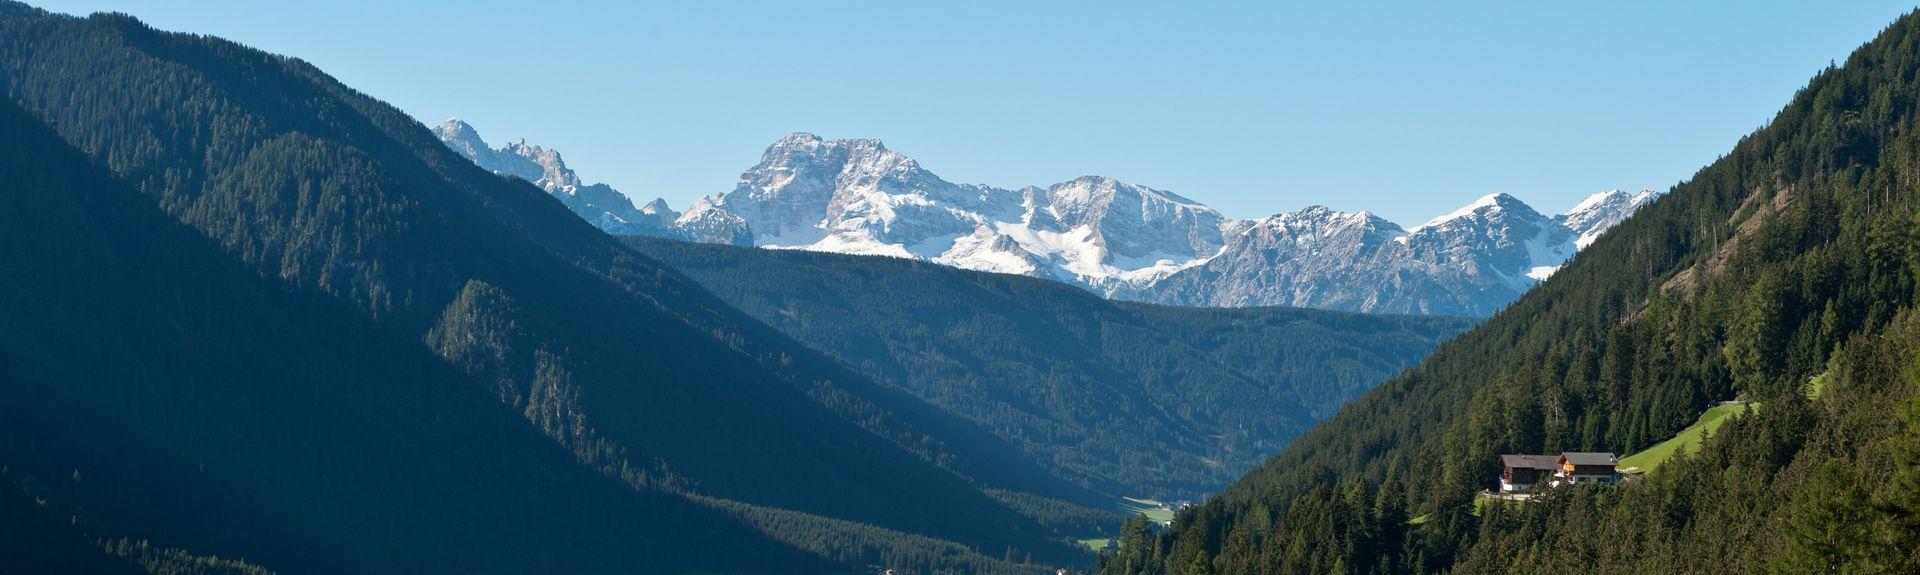 Gsies, Alto Adige, Trentino-Alto Adige/South Tyrol, Italy